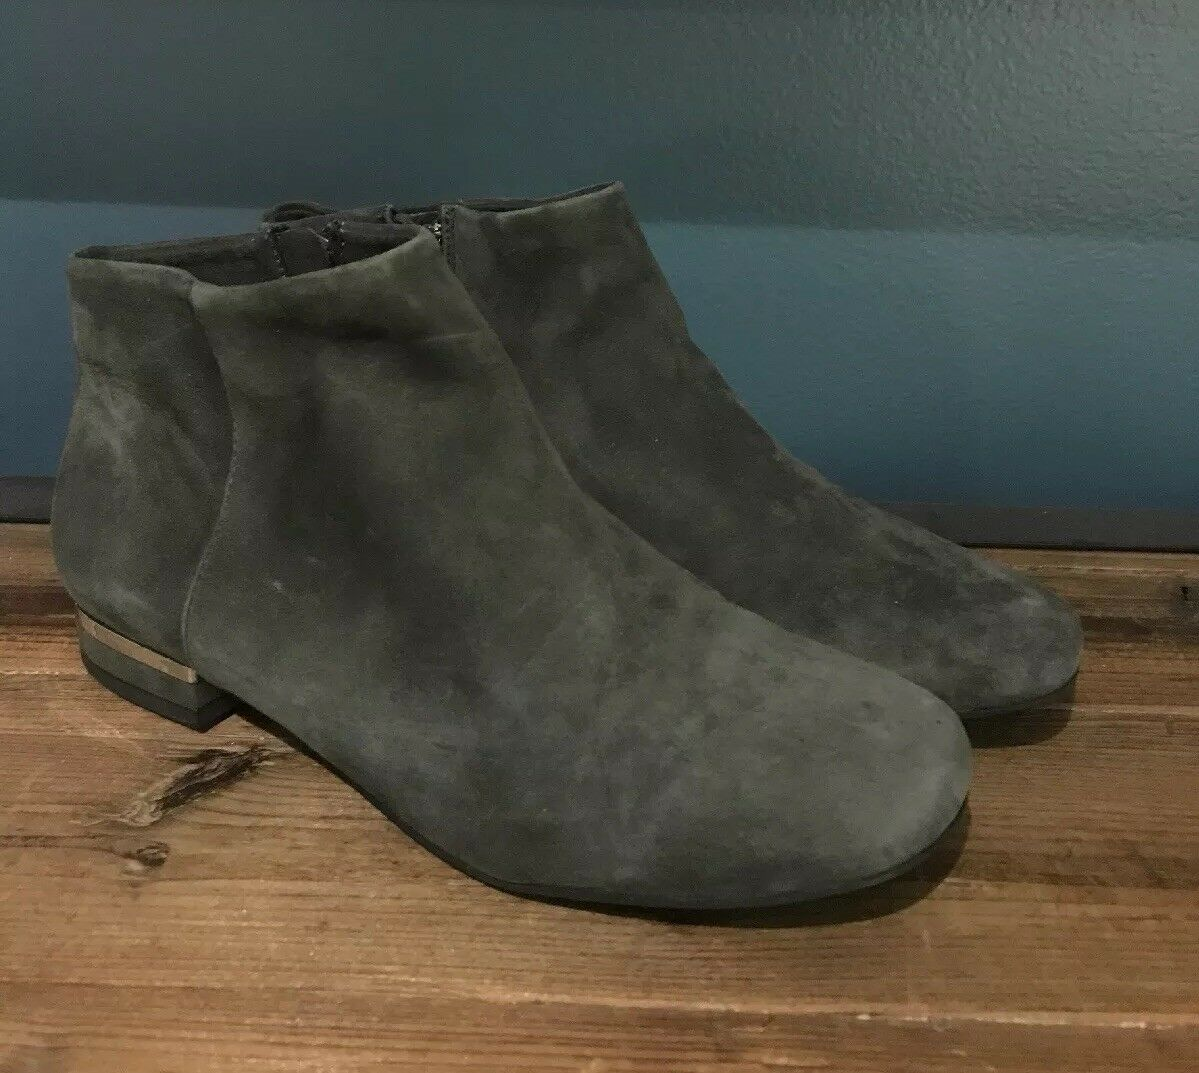 NEW Anthropologie Lein.do Delphinia Suede Ankle Stivali Stivali Stivali Size 7 Gray Bootie 228c0a